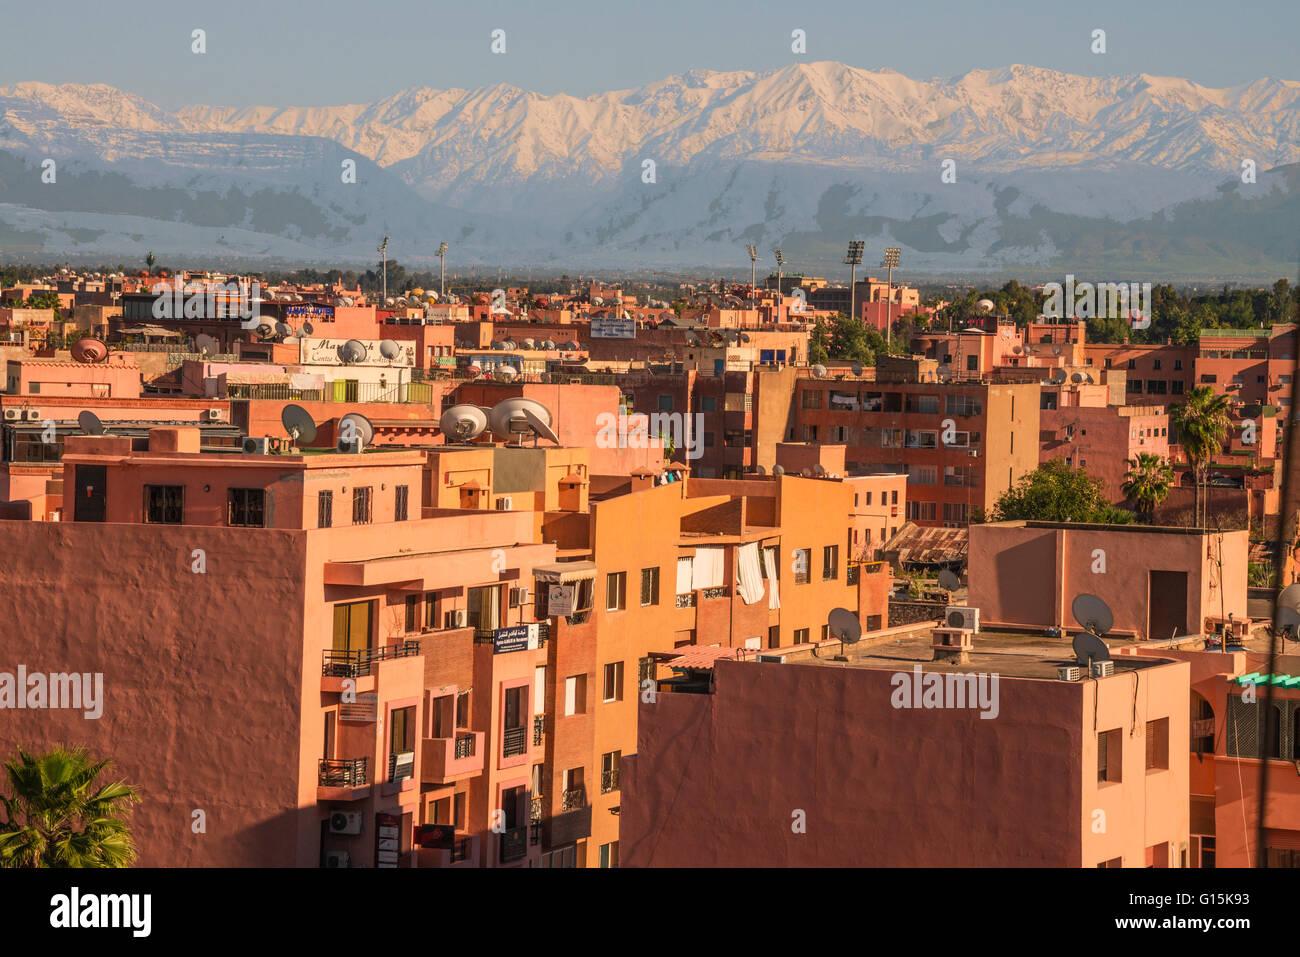 Marrakesch-Panorama, mit Atlas-Gebirge am Backgroud, Marrakesch, Marokko, Nordafrika, Afrika Stockbild